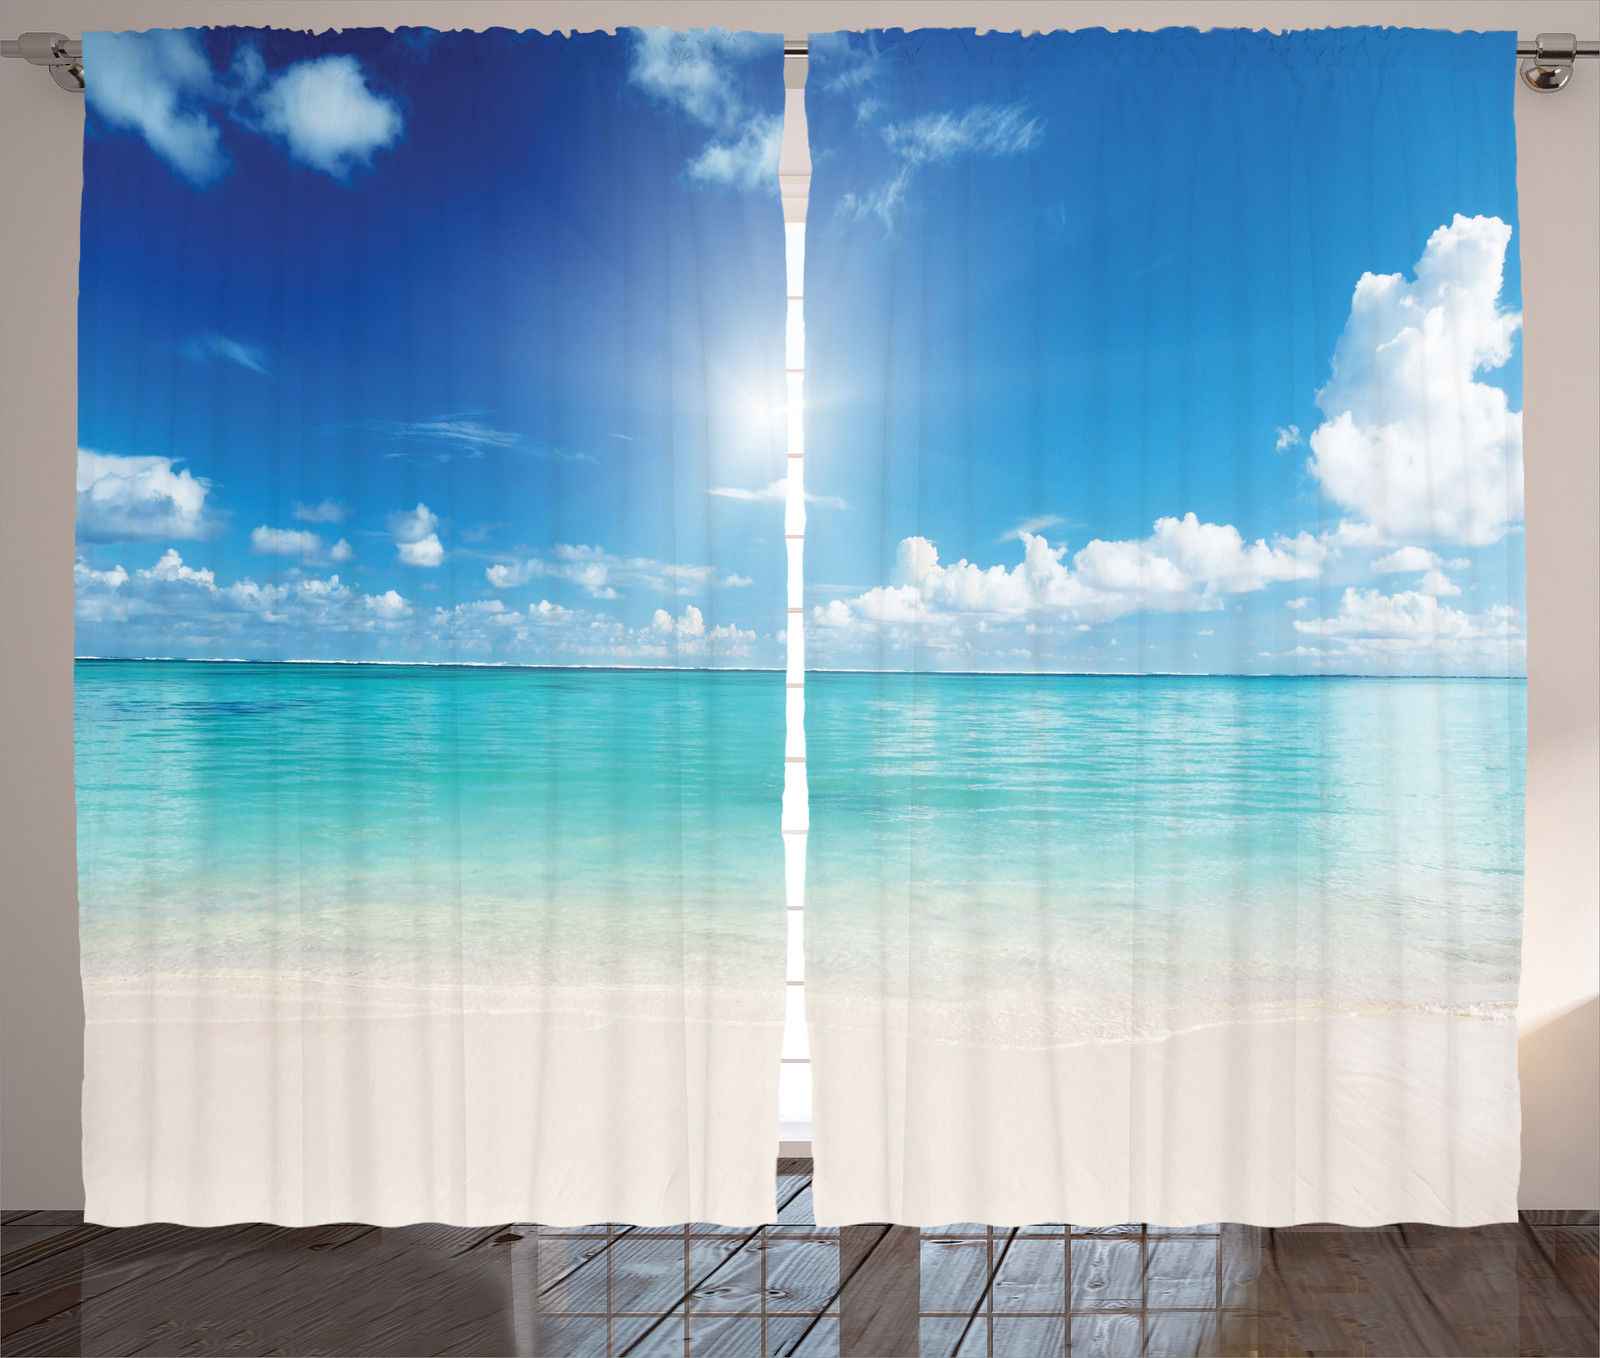 Cloud Window Curtains 3d Printing Nautical Home Decor: Beach Landscape Golden Sand Tropical Sun Hot Heaven Print